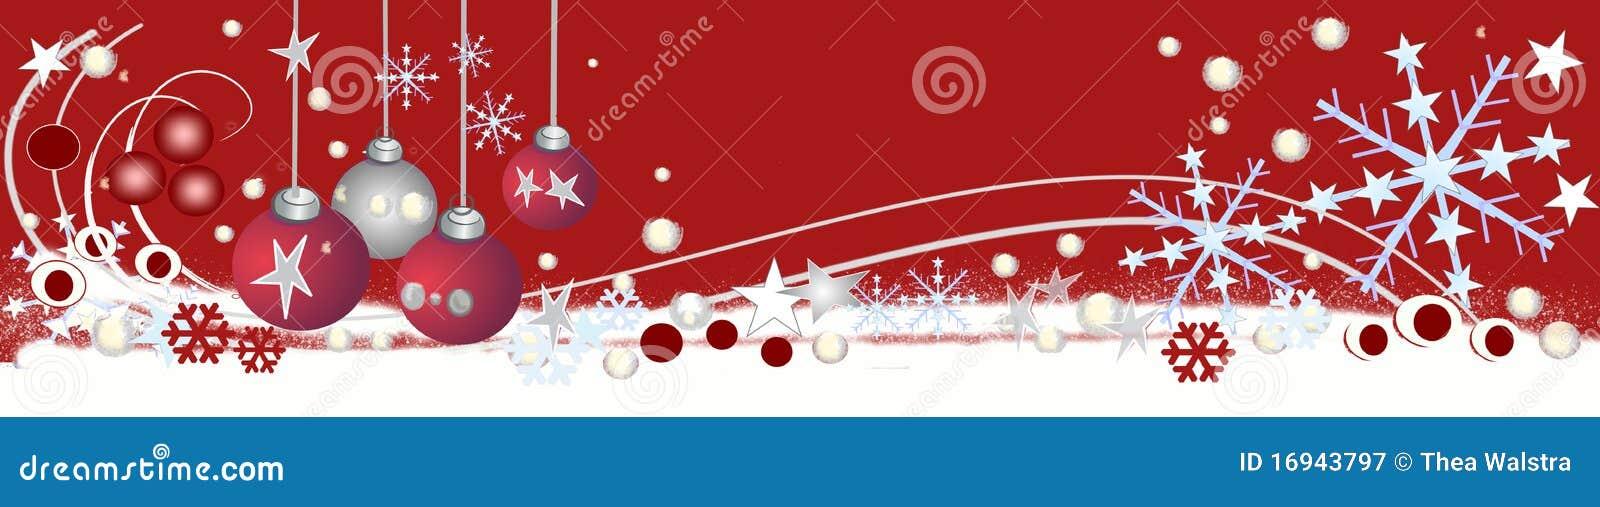 Christmas Header.Decorative Christmas Header Stock Illustration